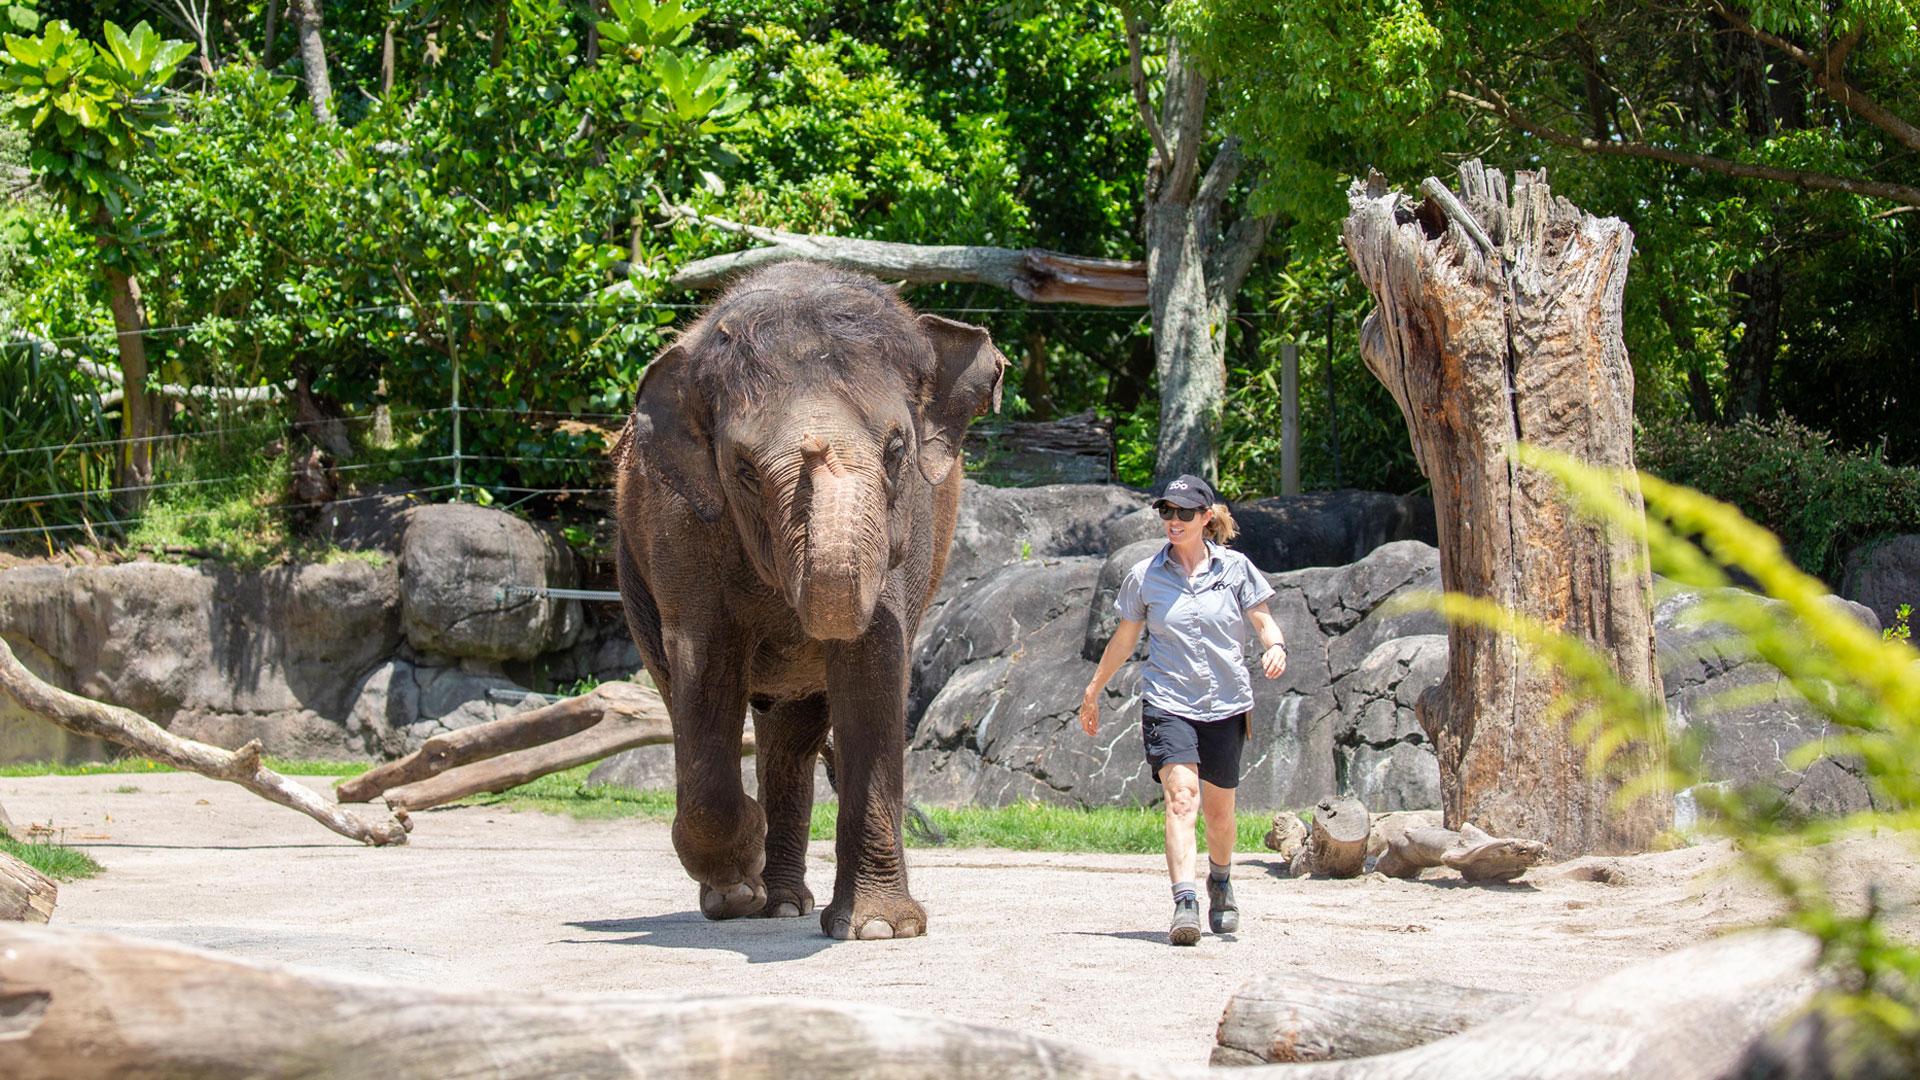 https://rfacdn.nz/zoo/assets/media/elephant-news-gallery-7.jpg